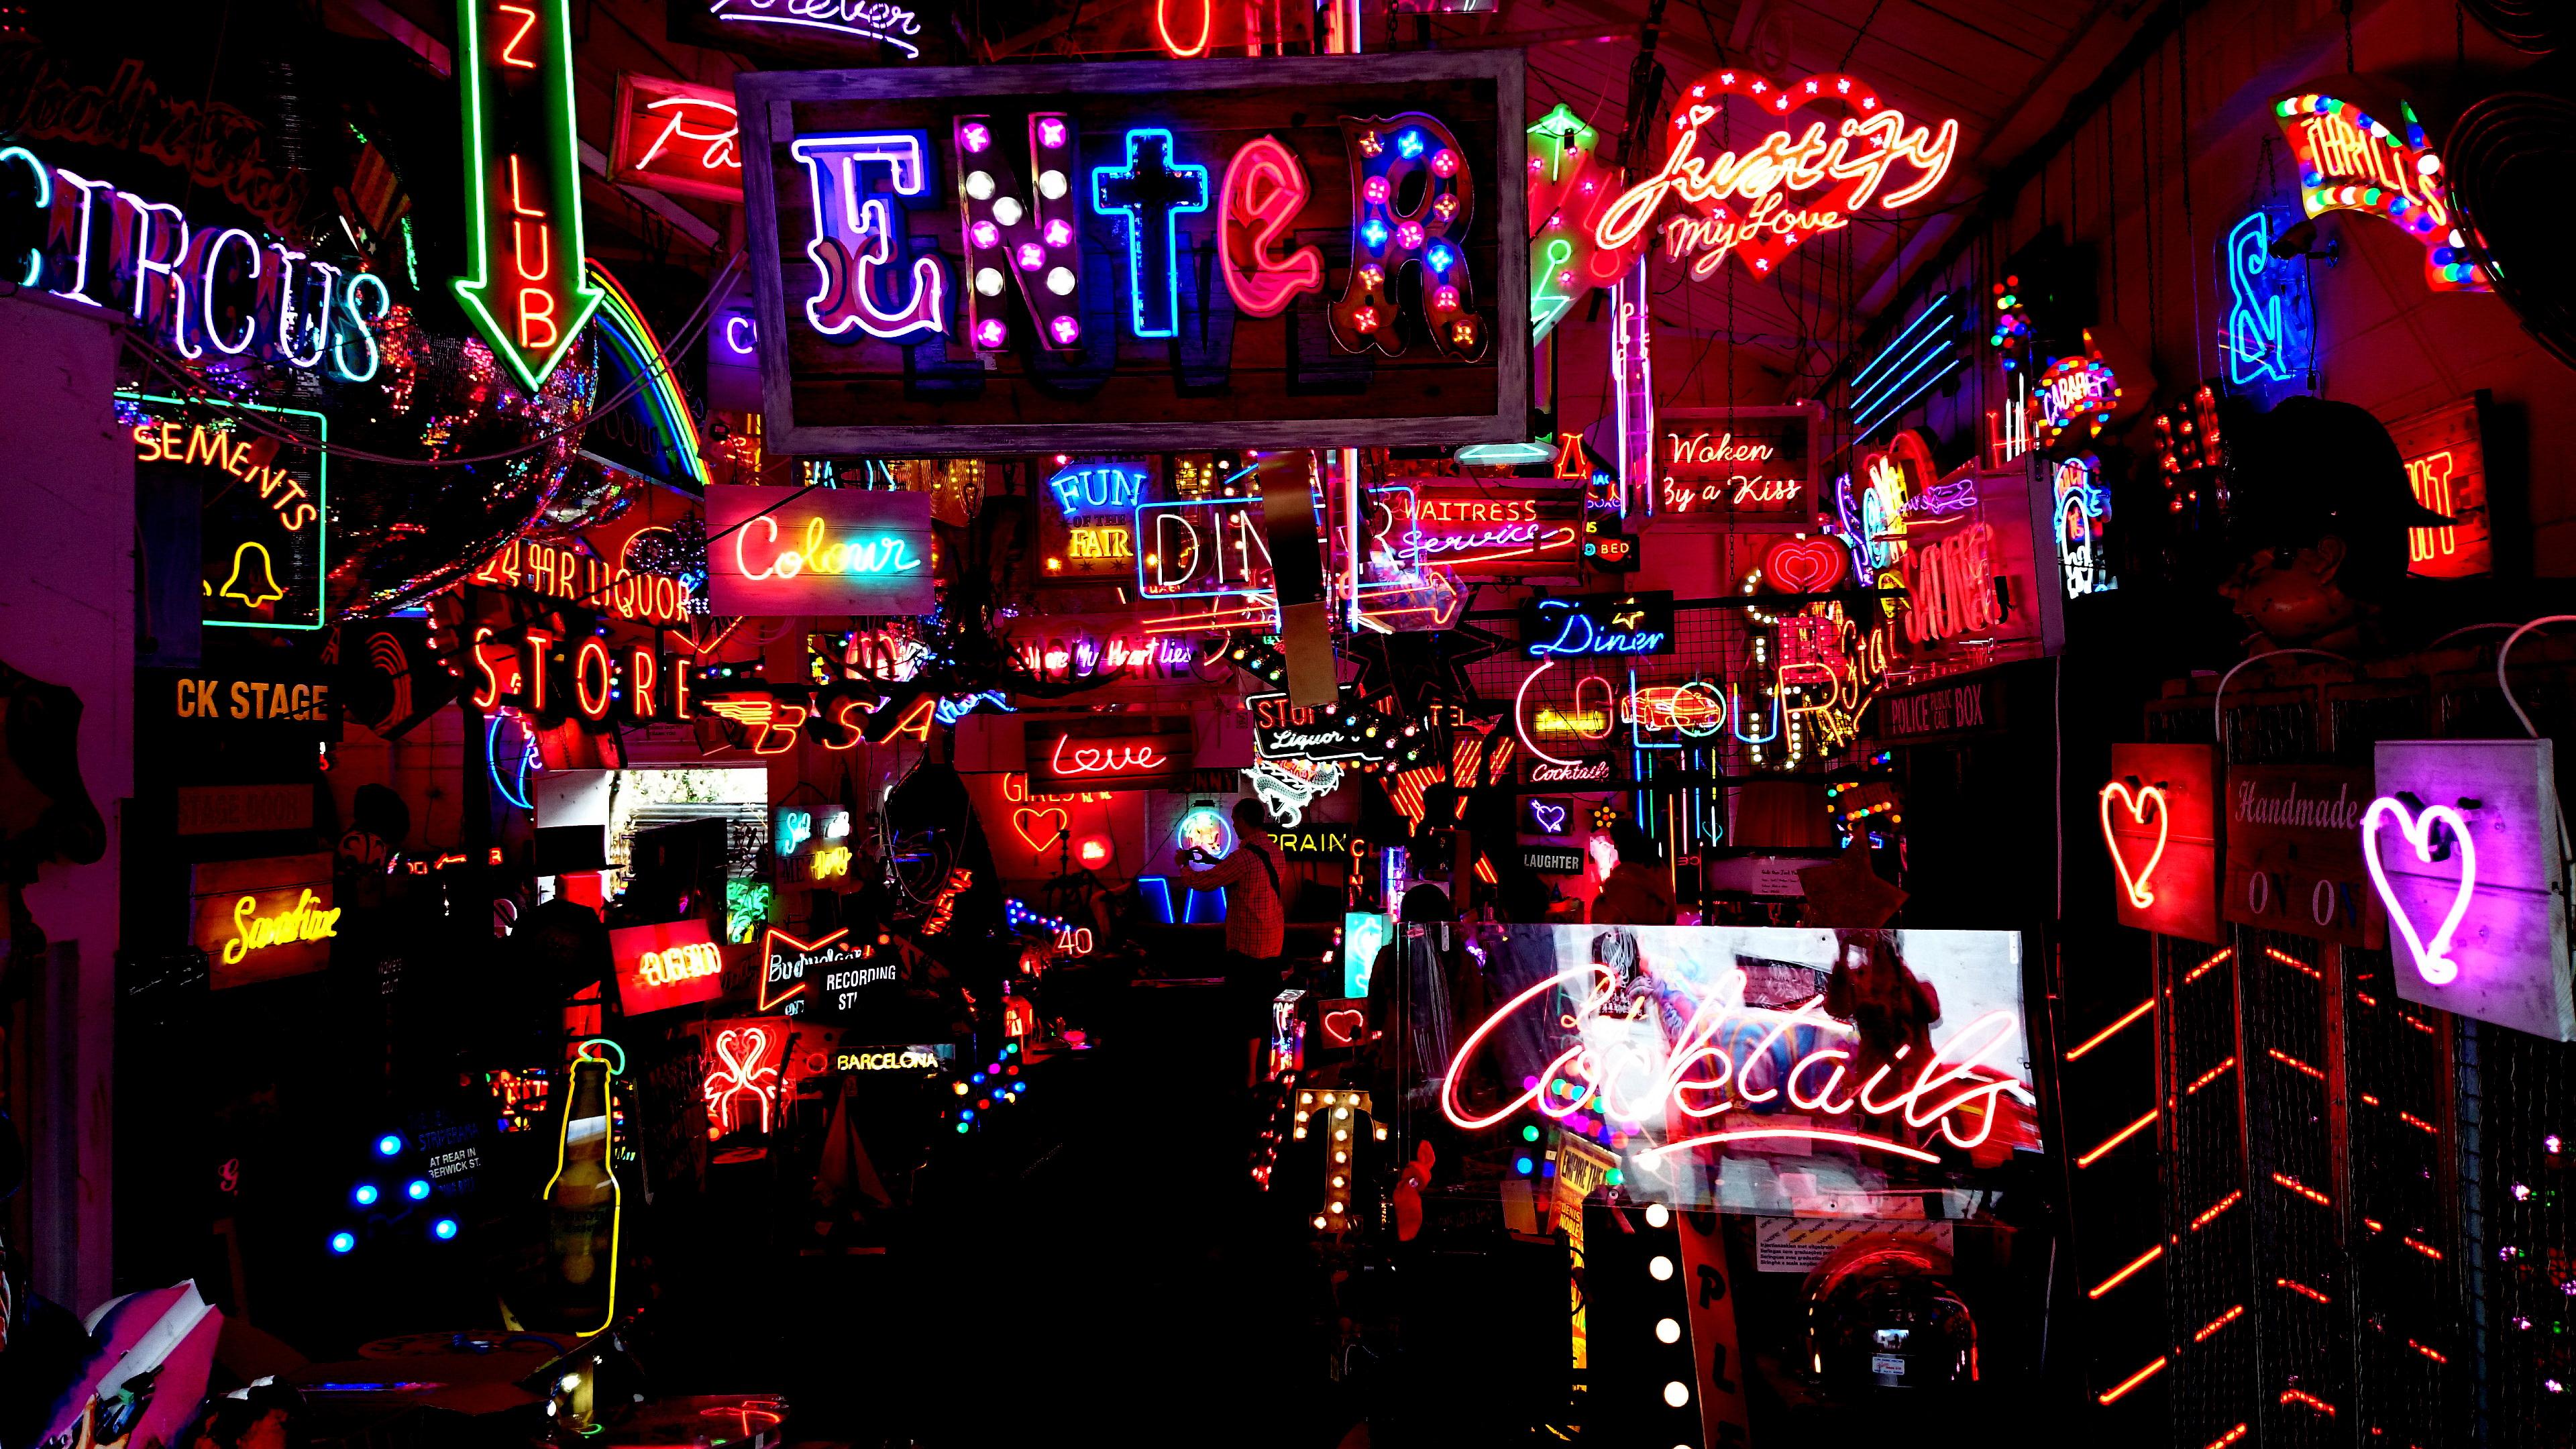 Neon fantasy delight in London